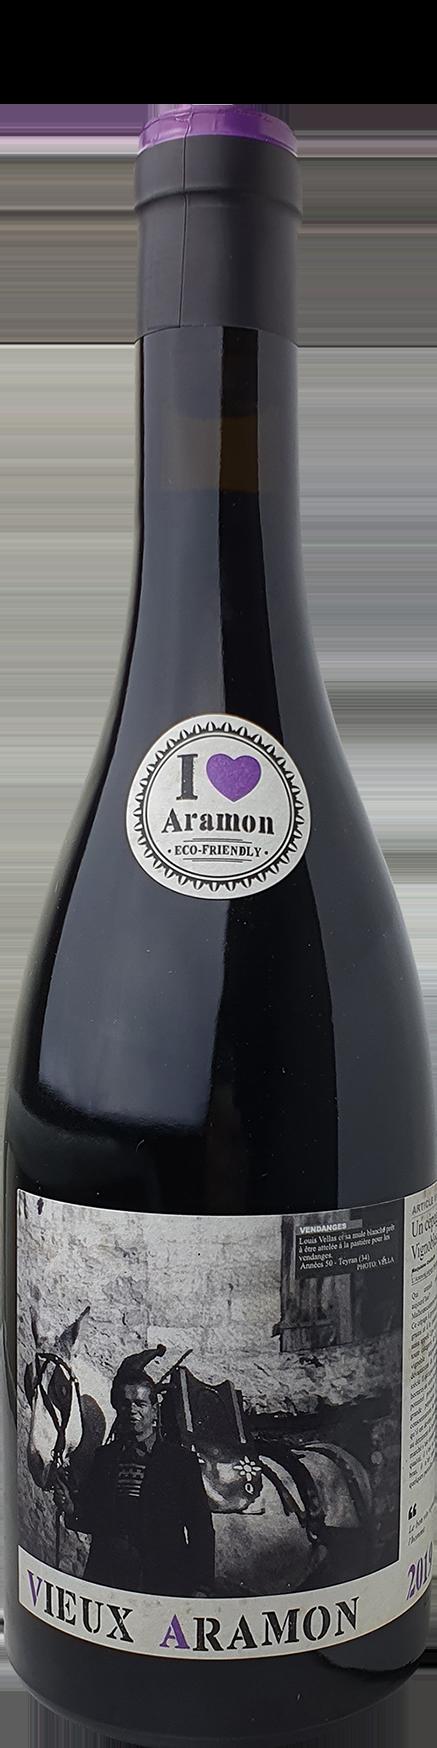 2019 Vieux Aramon